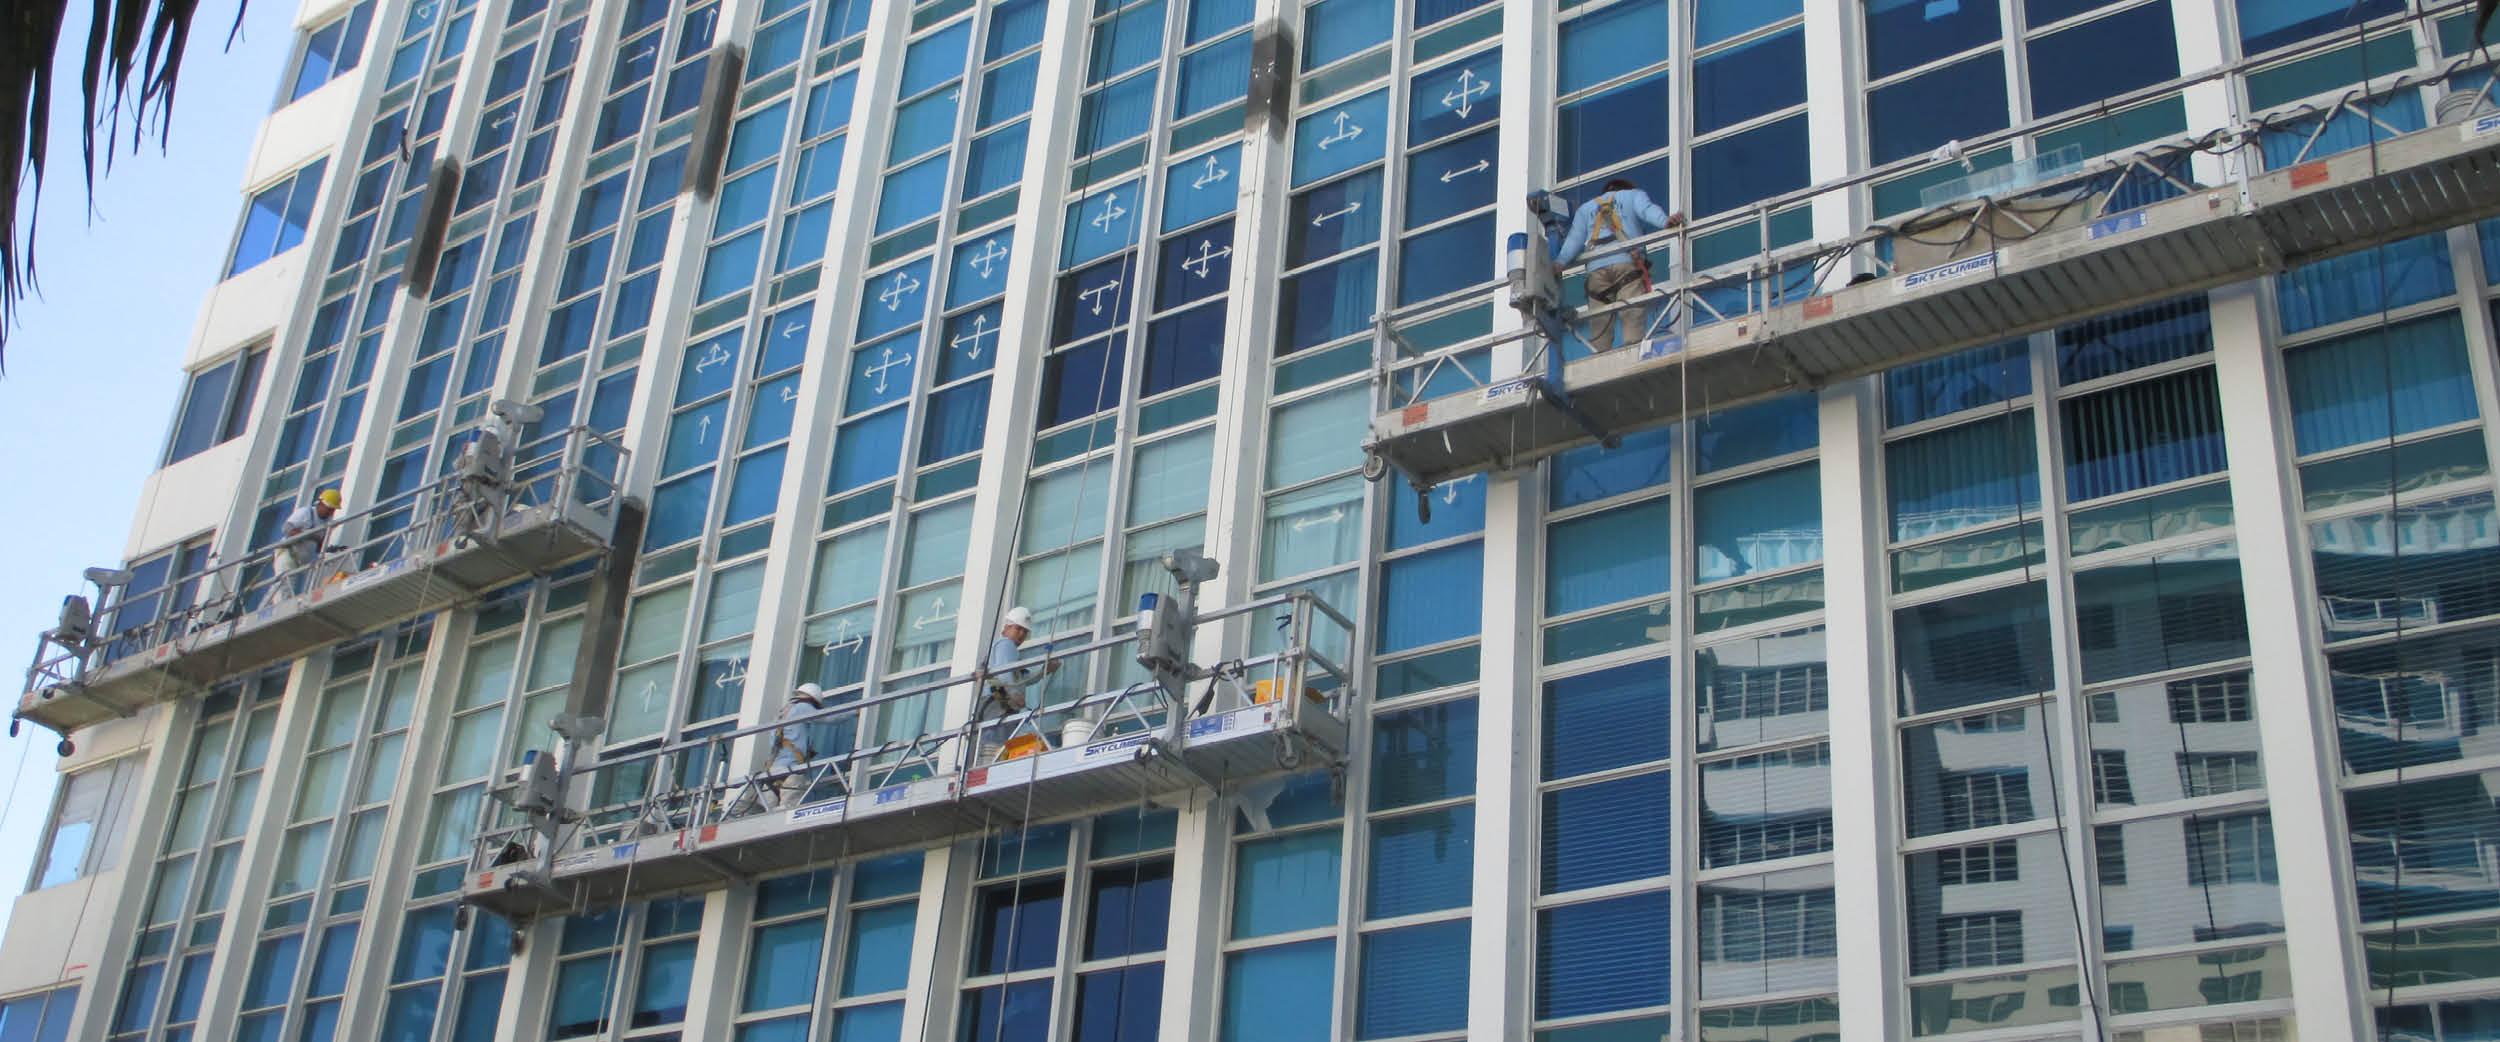 testing façade access equipment - HD2500×1042